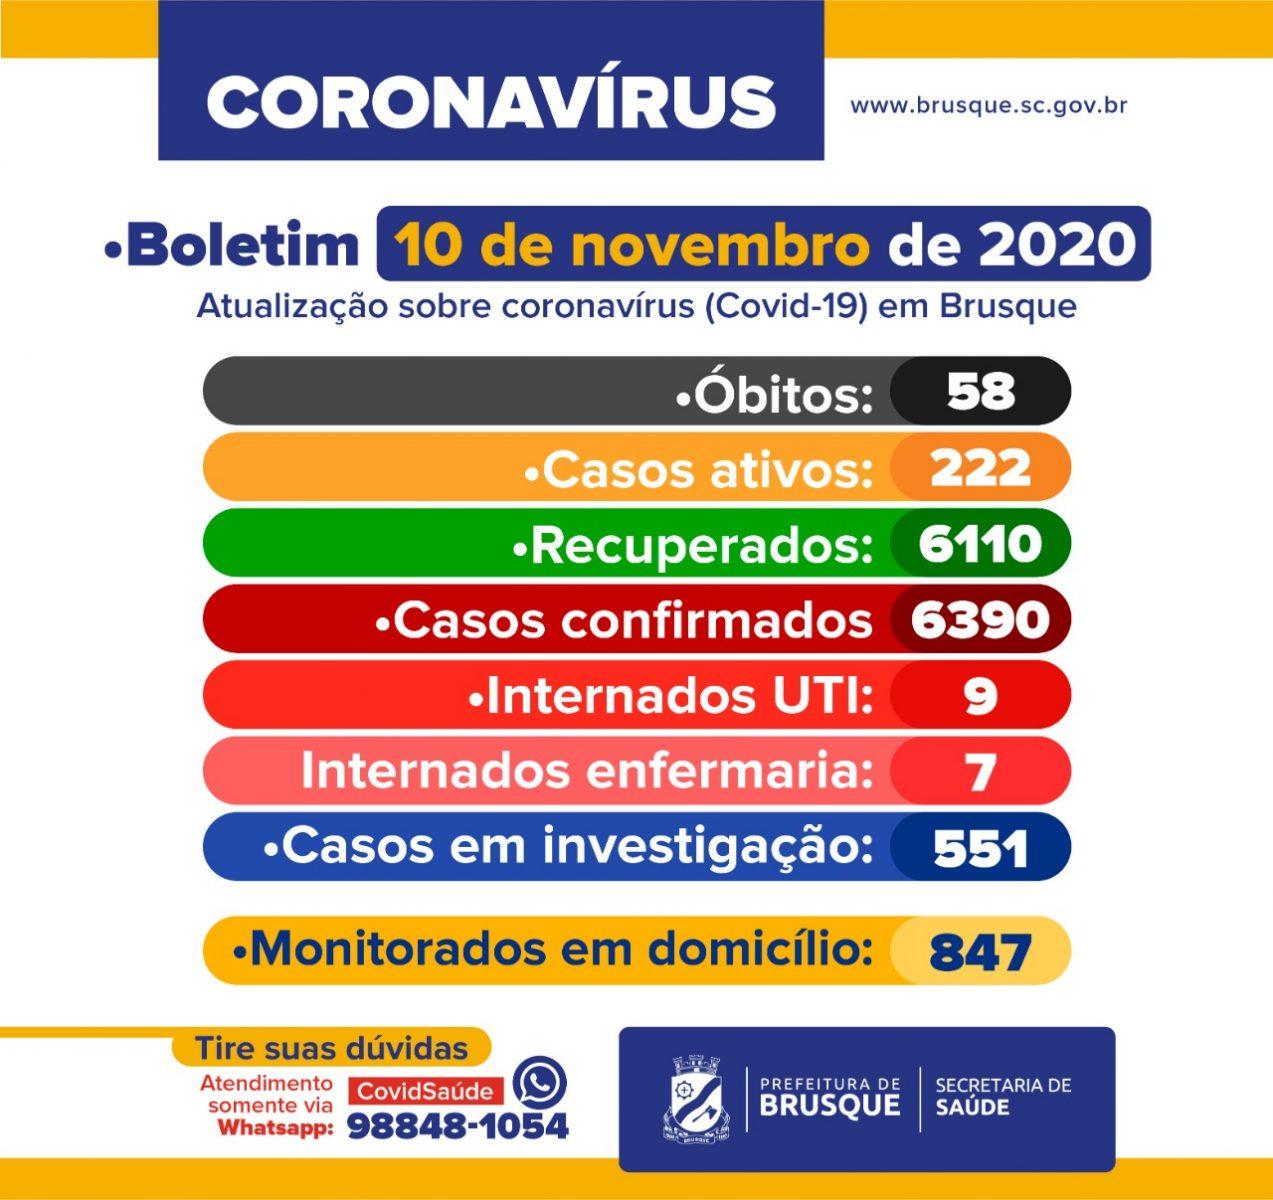 Covid-19: Confira o boletim epidemiológico desta terça-feira (10)